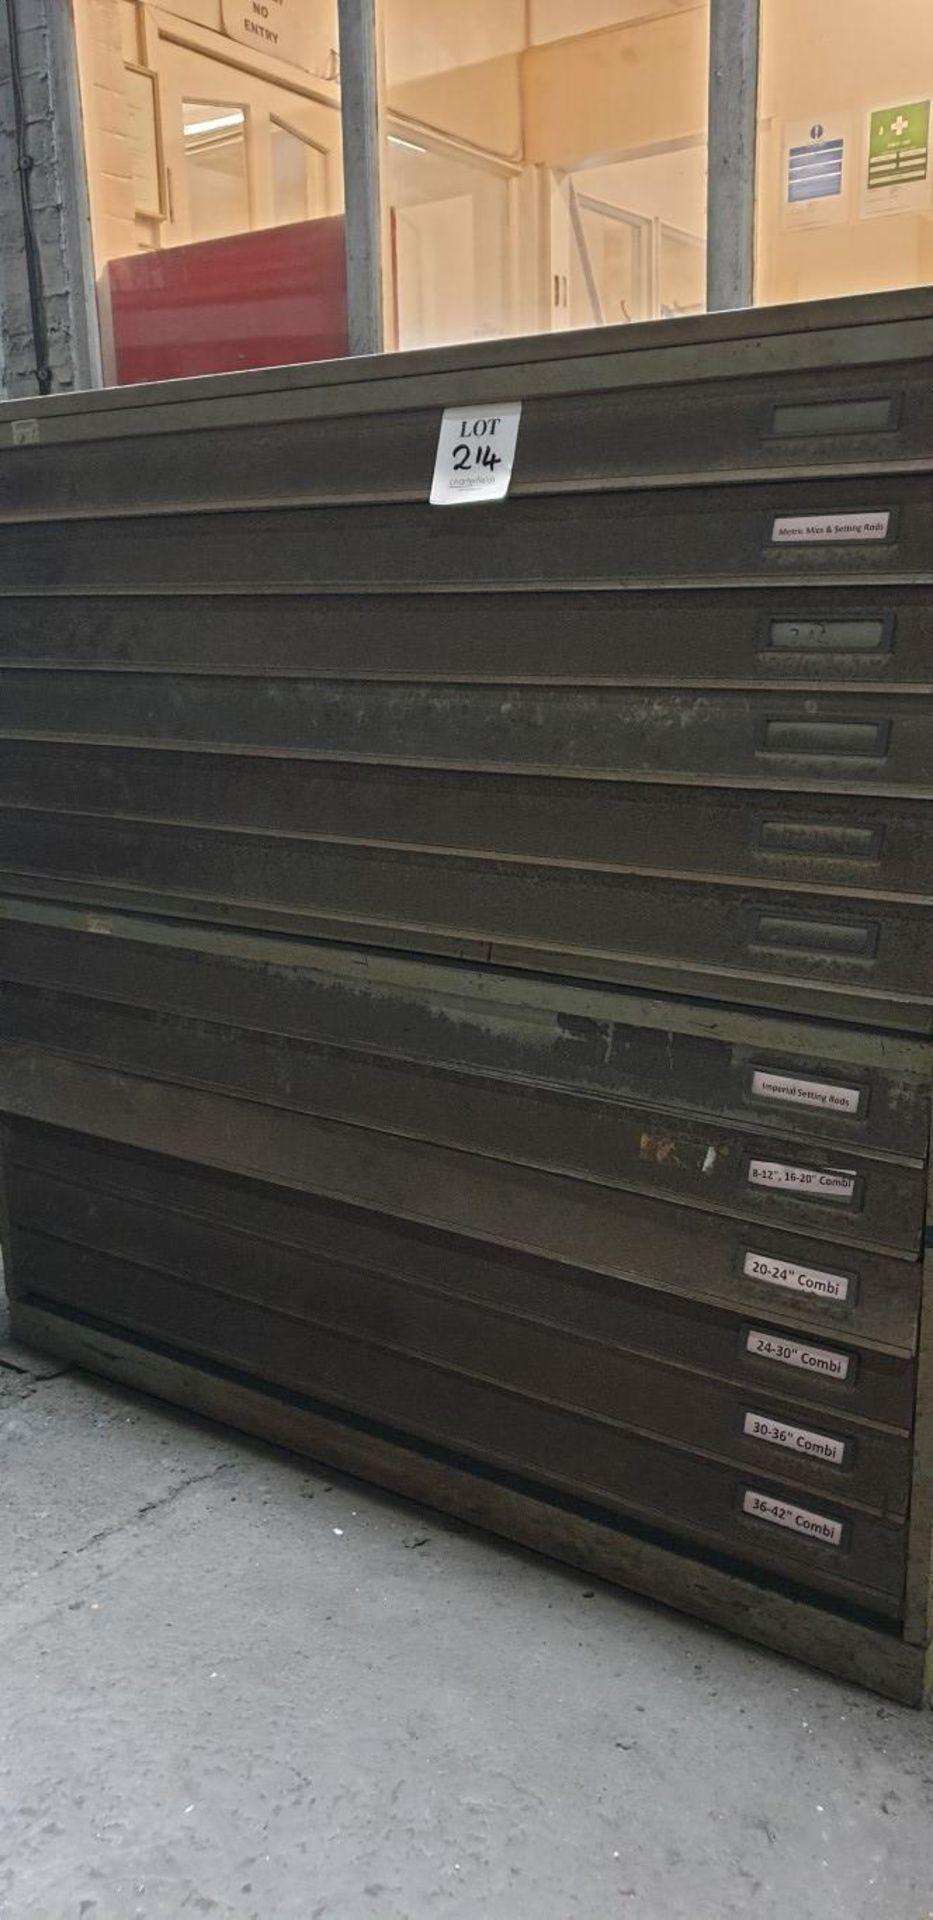 Lot 214 - 12 drawer, deep drawer cabinet